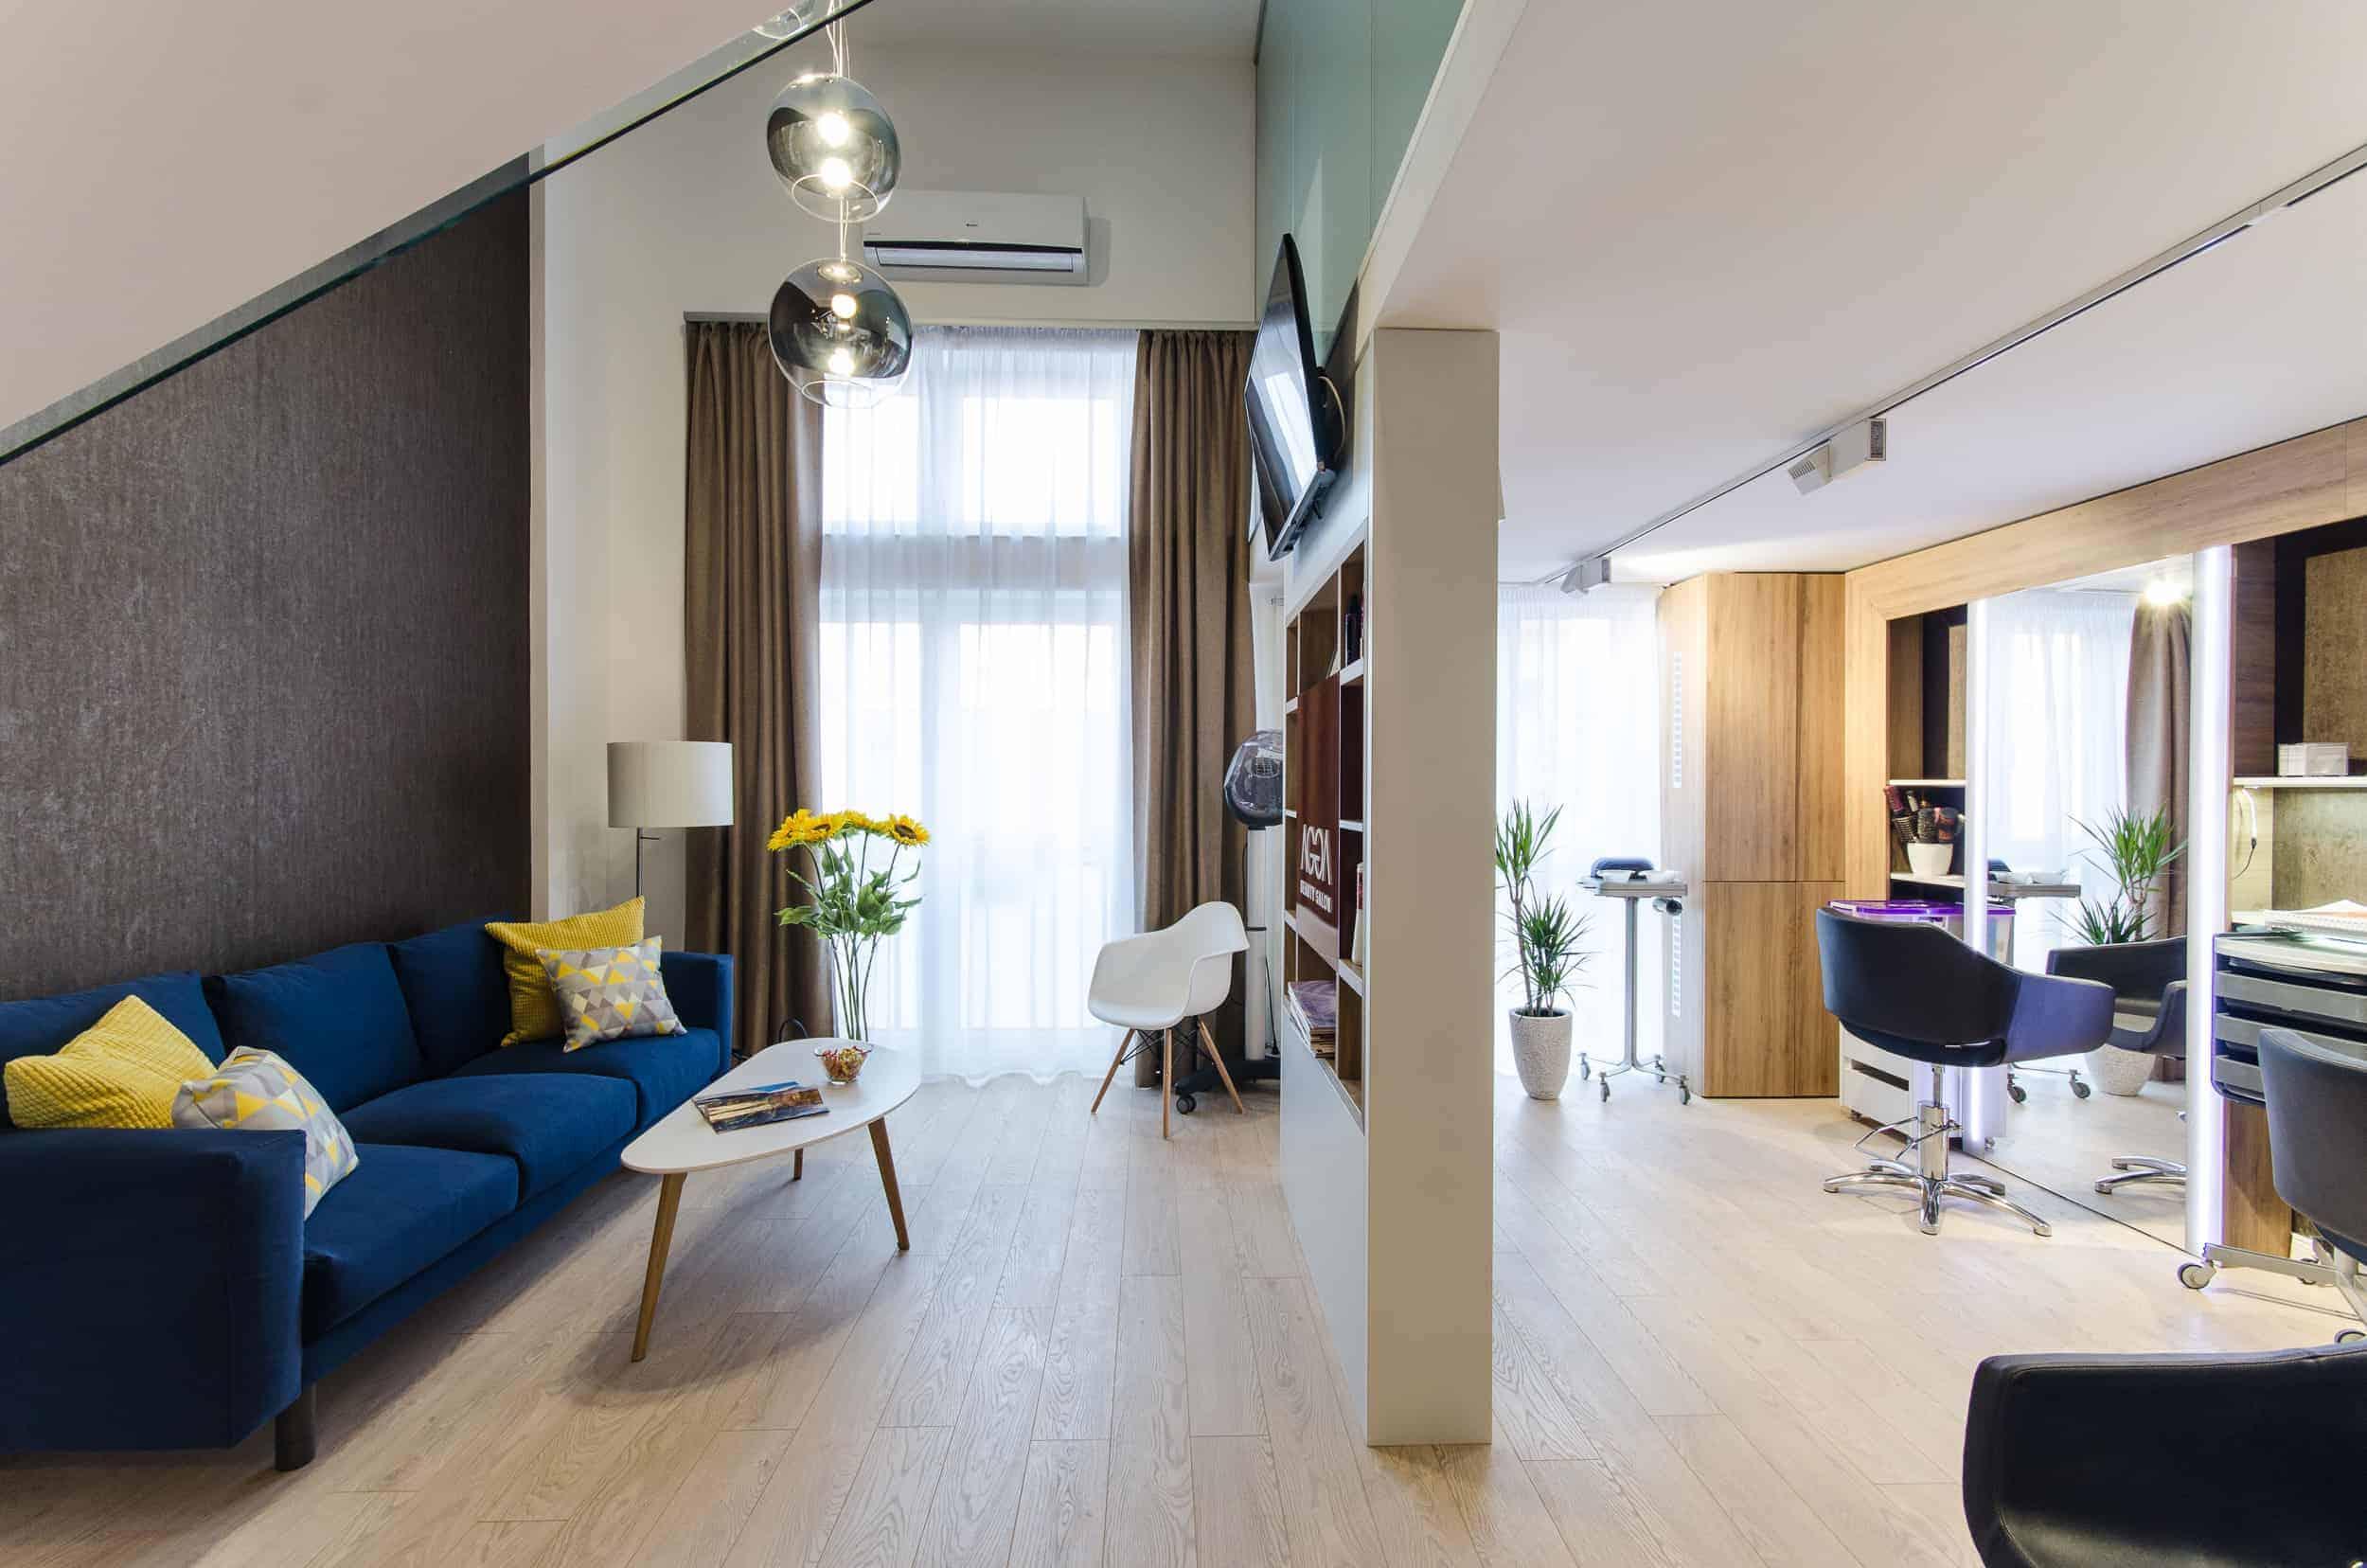 Agga Beauty Salon In Oradea Romania Design Ideas